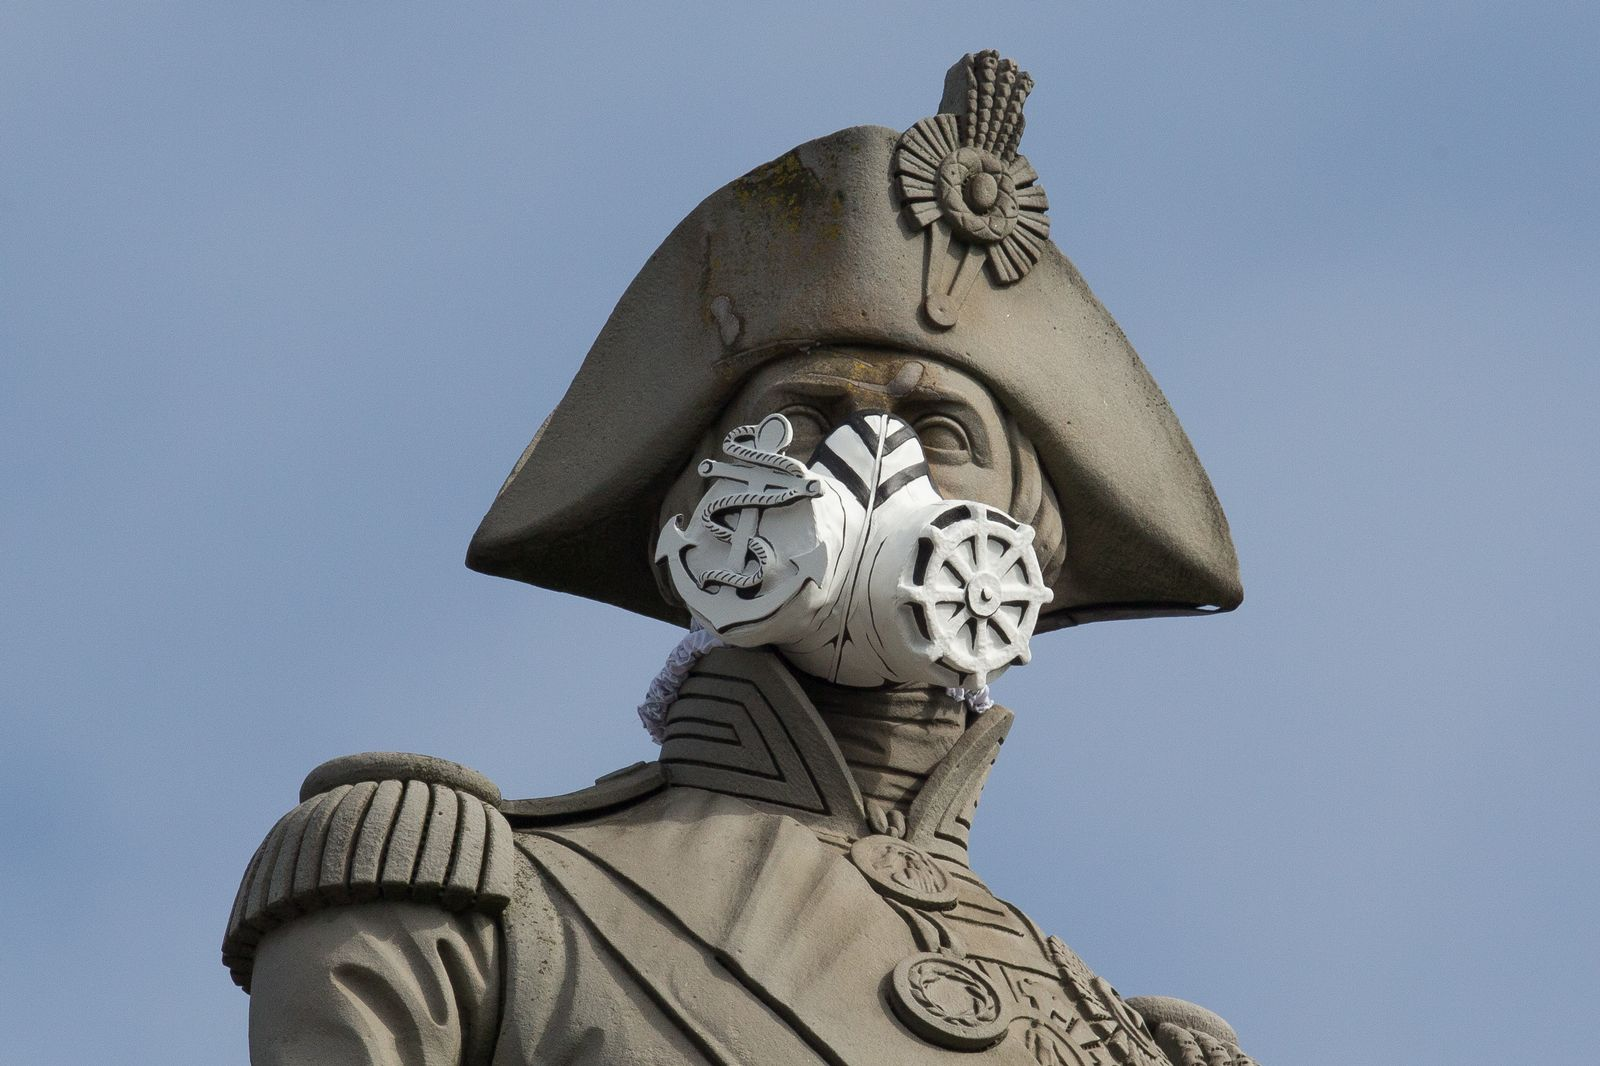 Feinstaub / Statue / Atemmaske / London